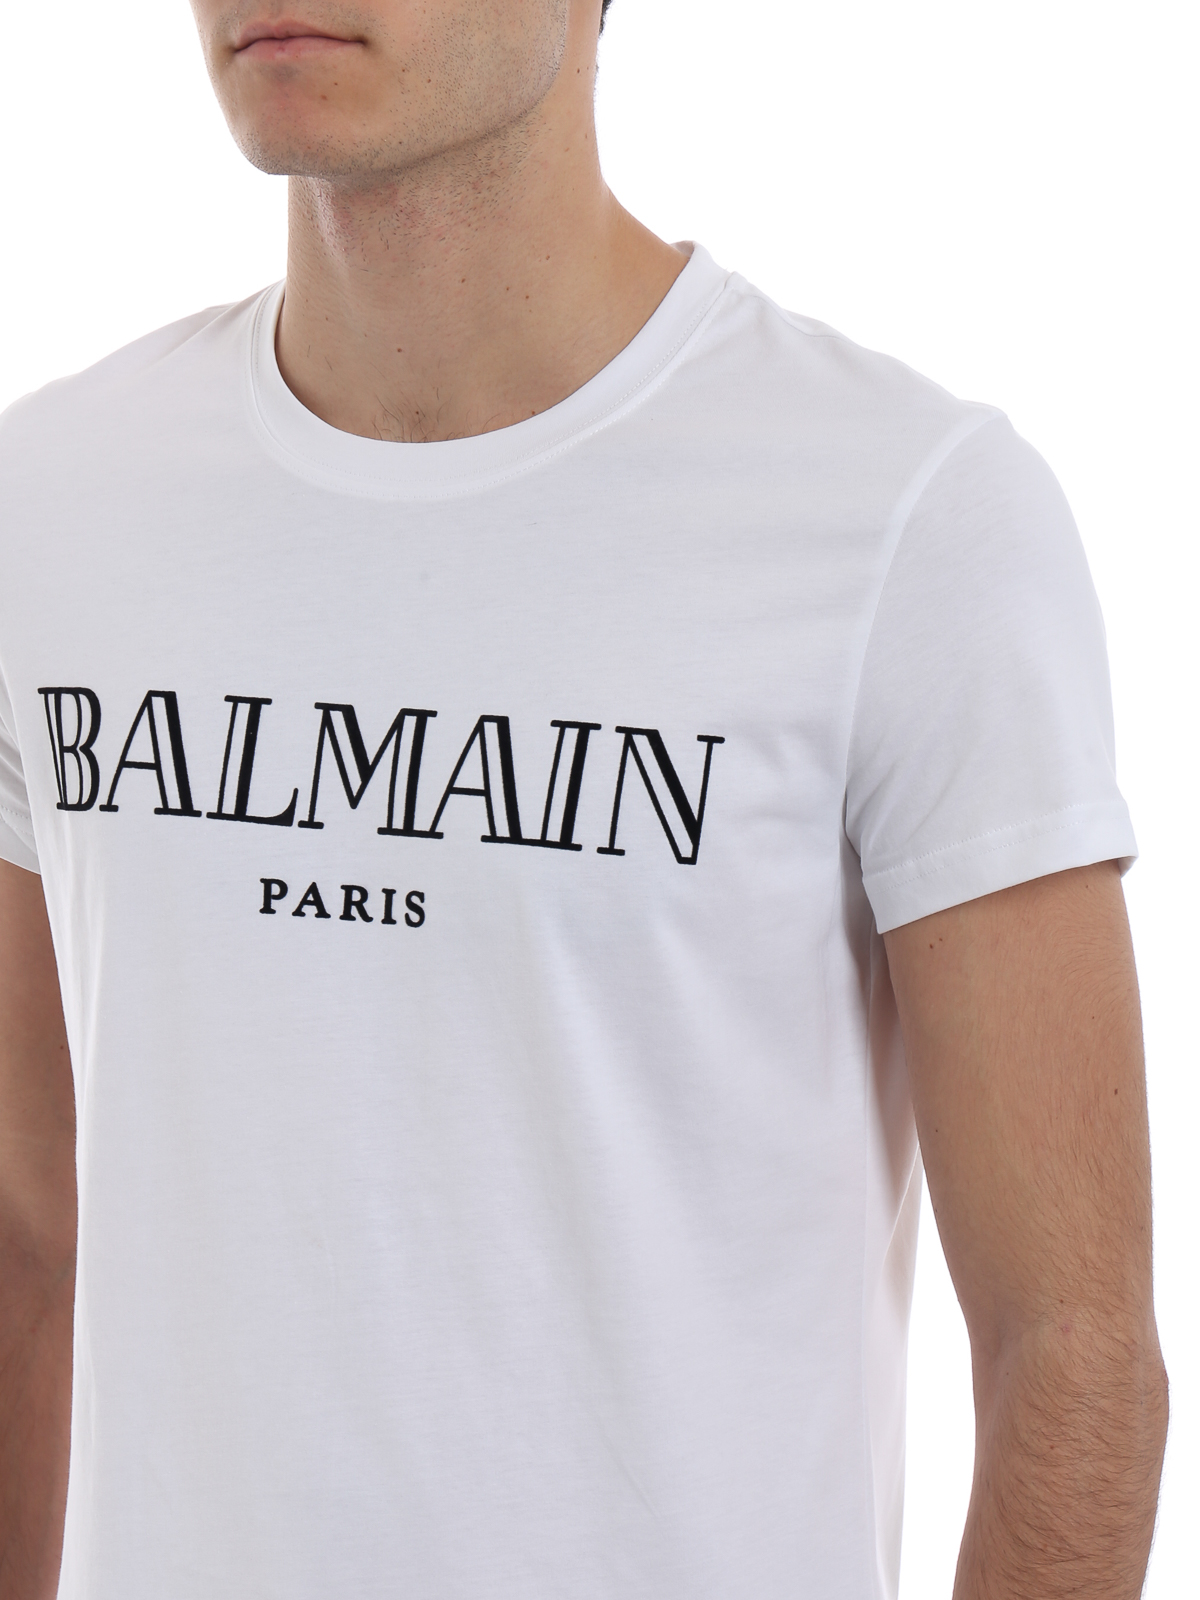 2a5087718 Balmain - Balmain Paris velvet logo cotton T-shirt - t-shirts ...